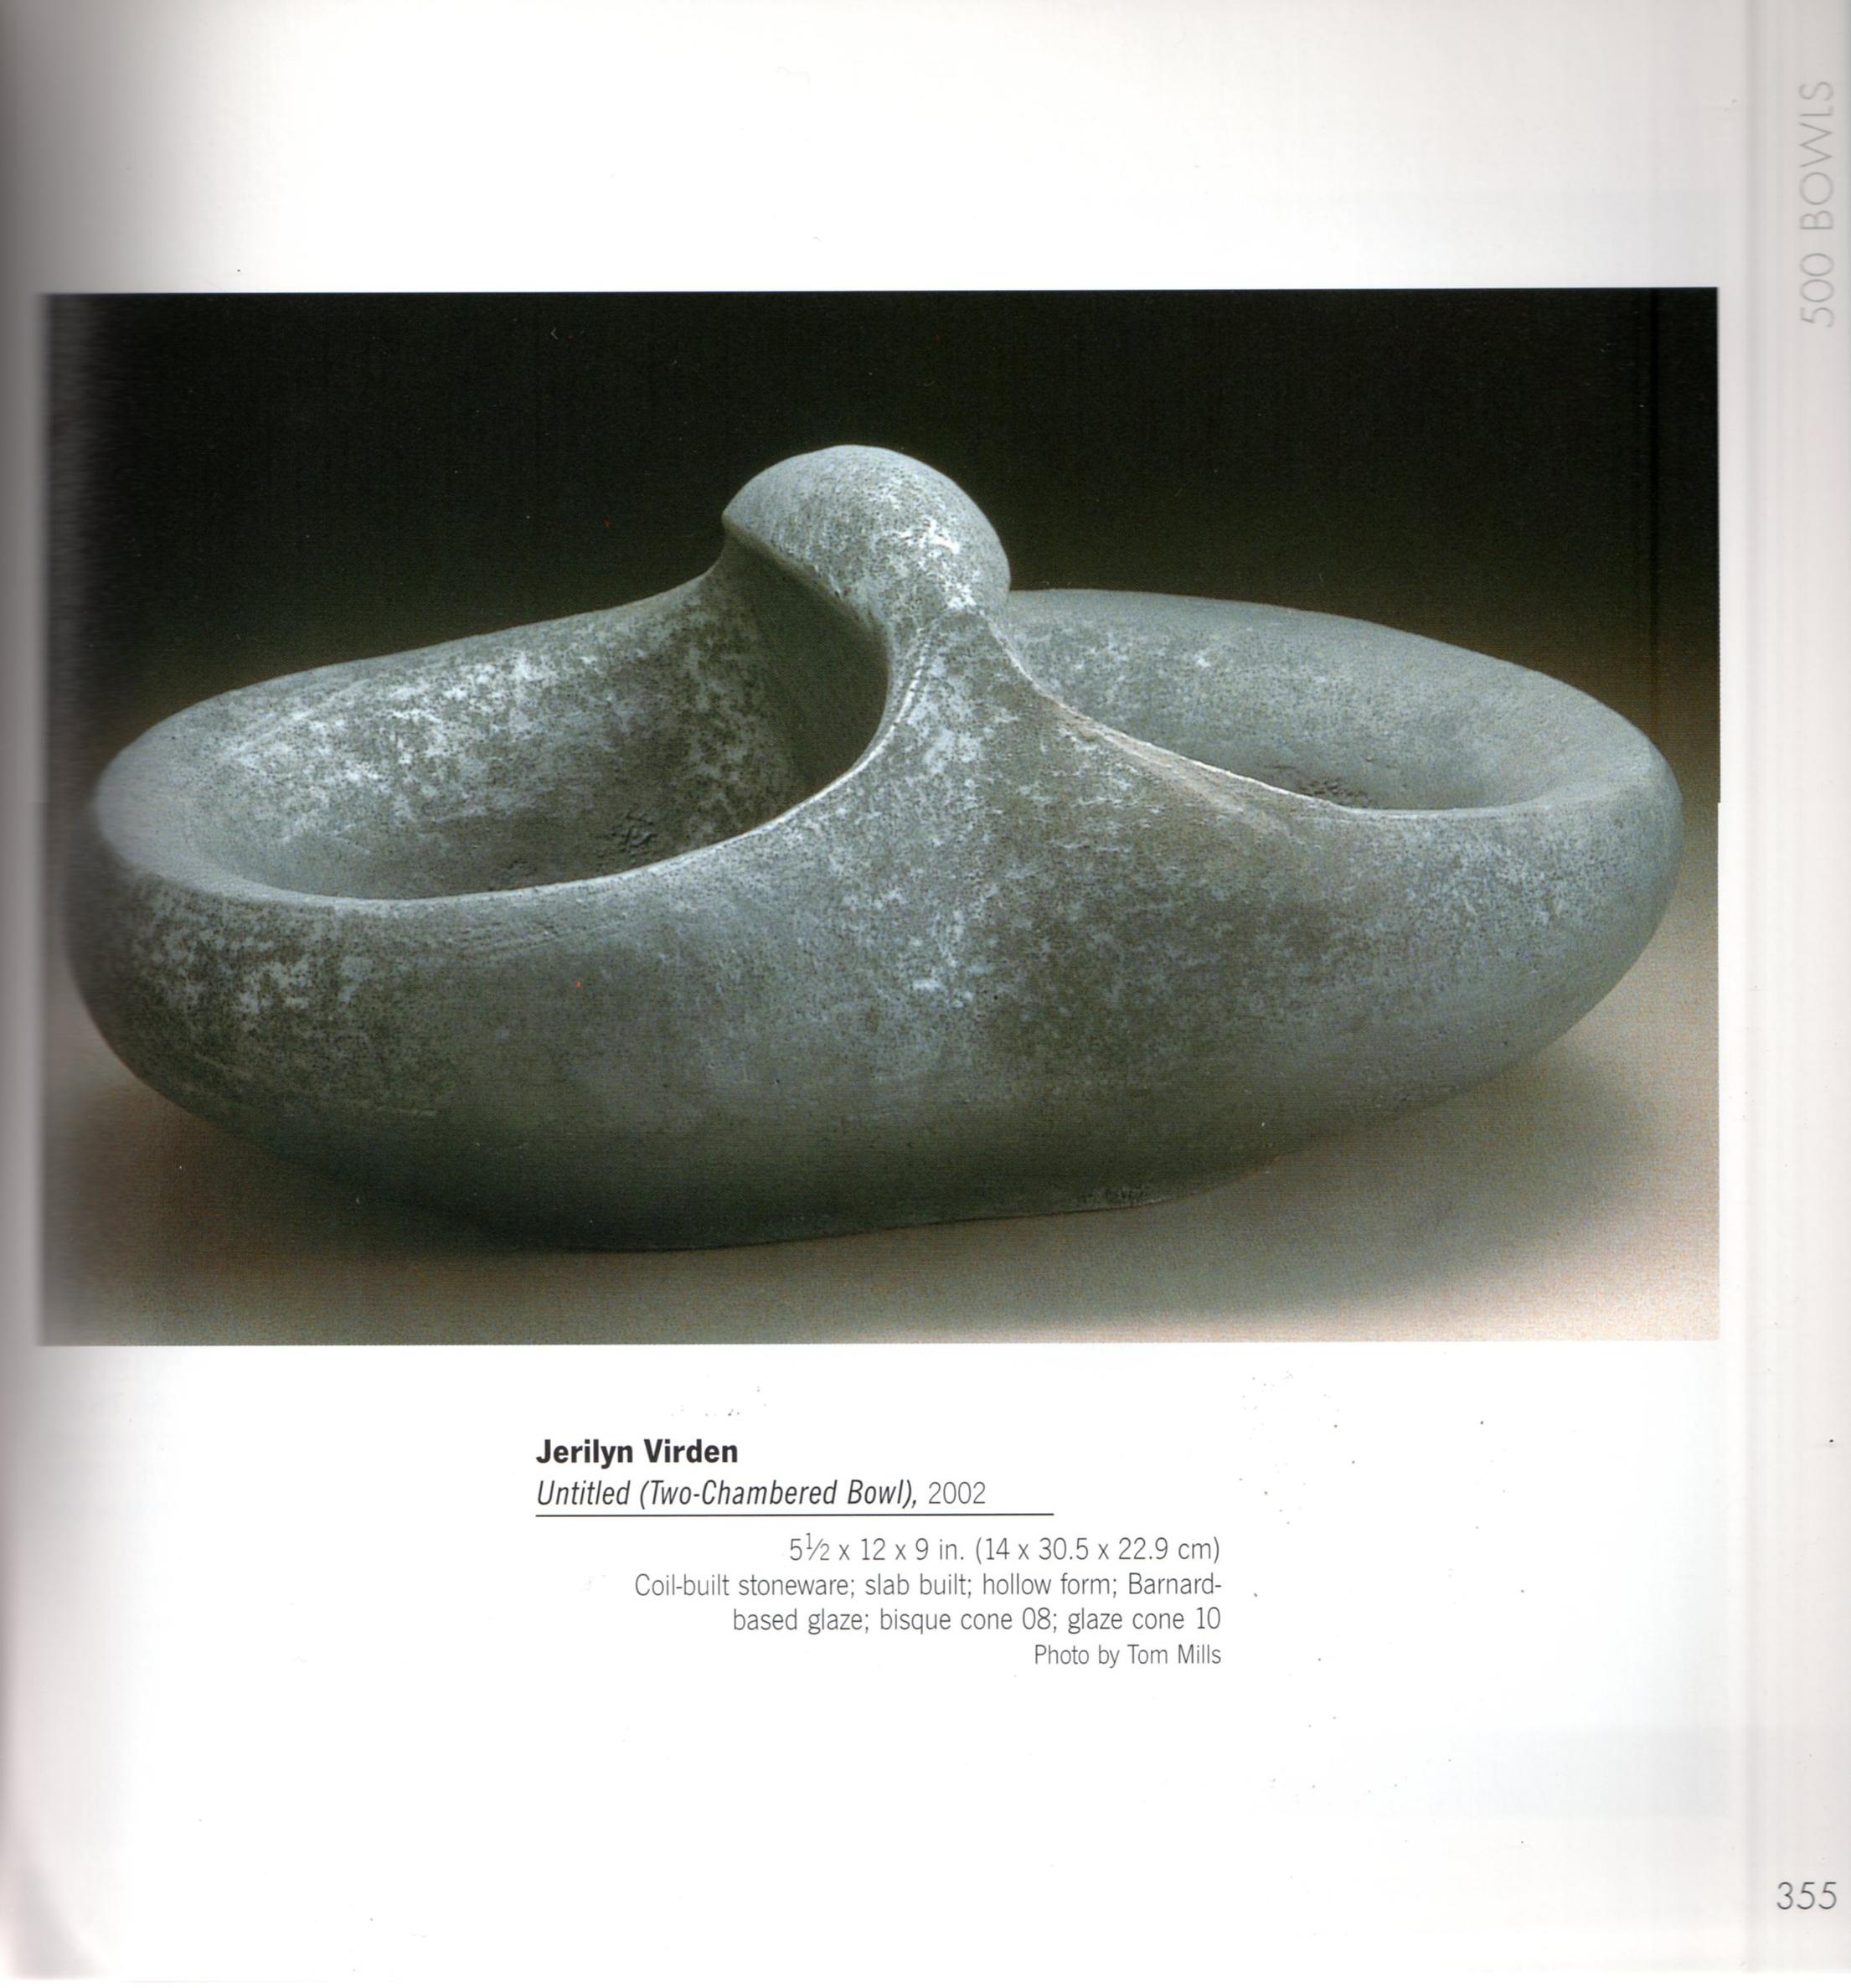 500 bowls p355.jpg